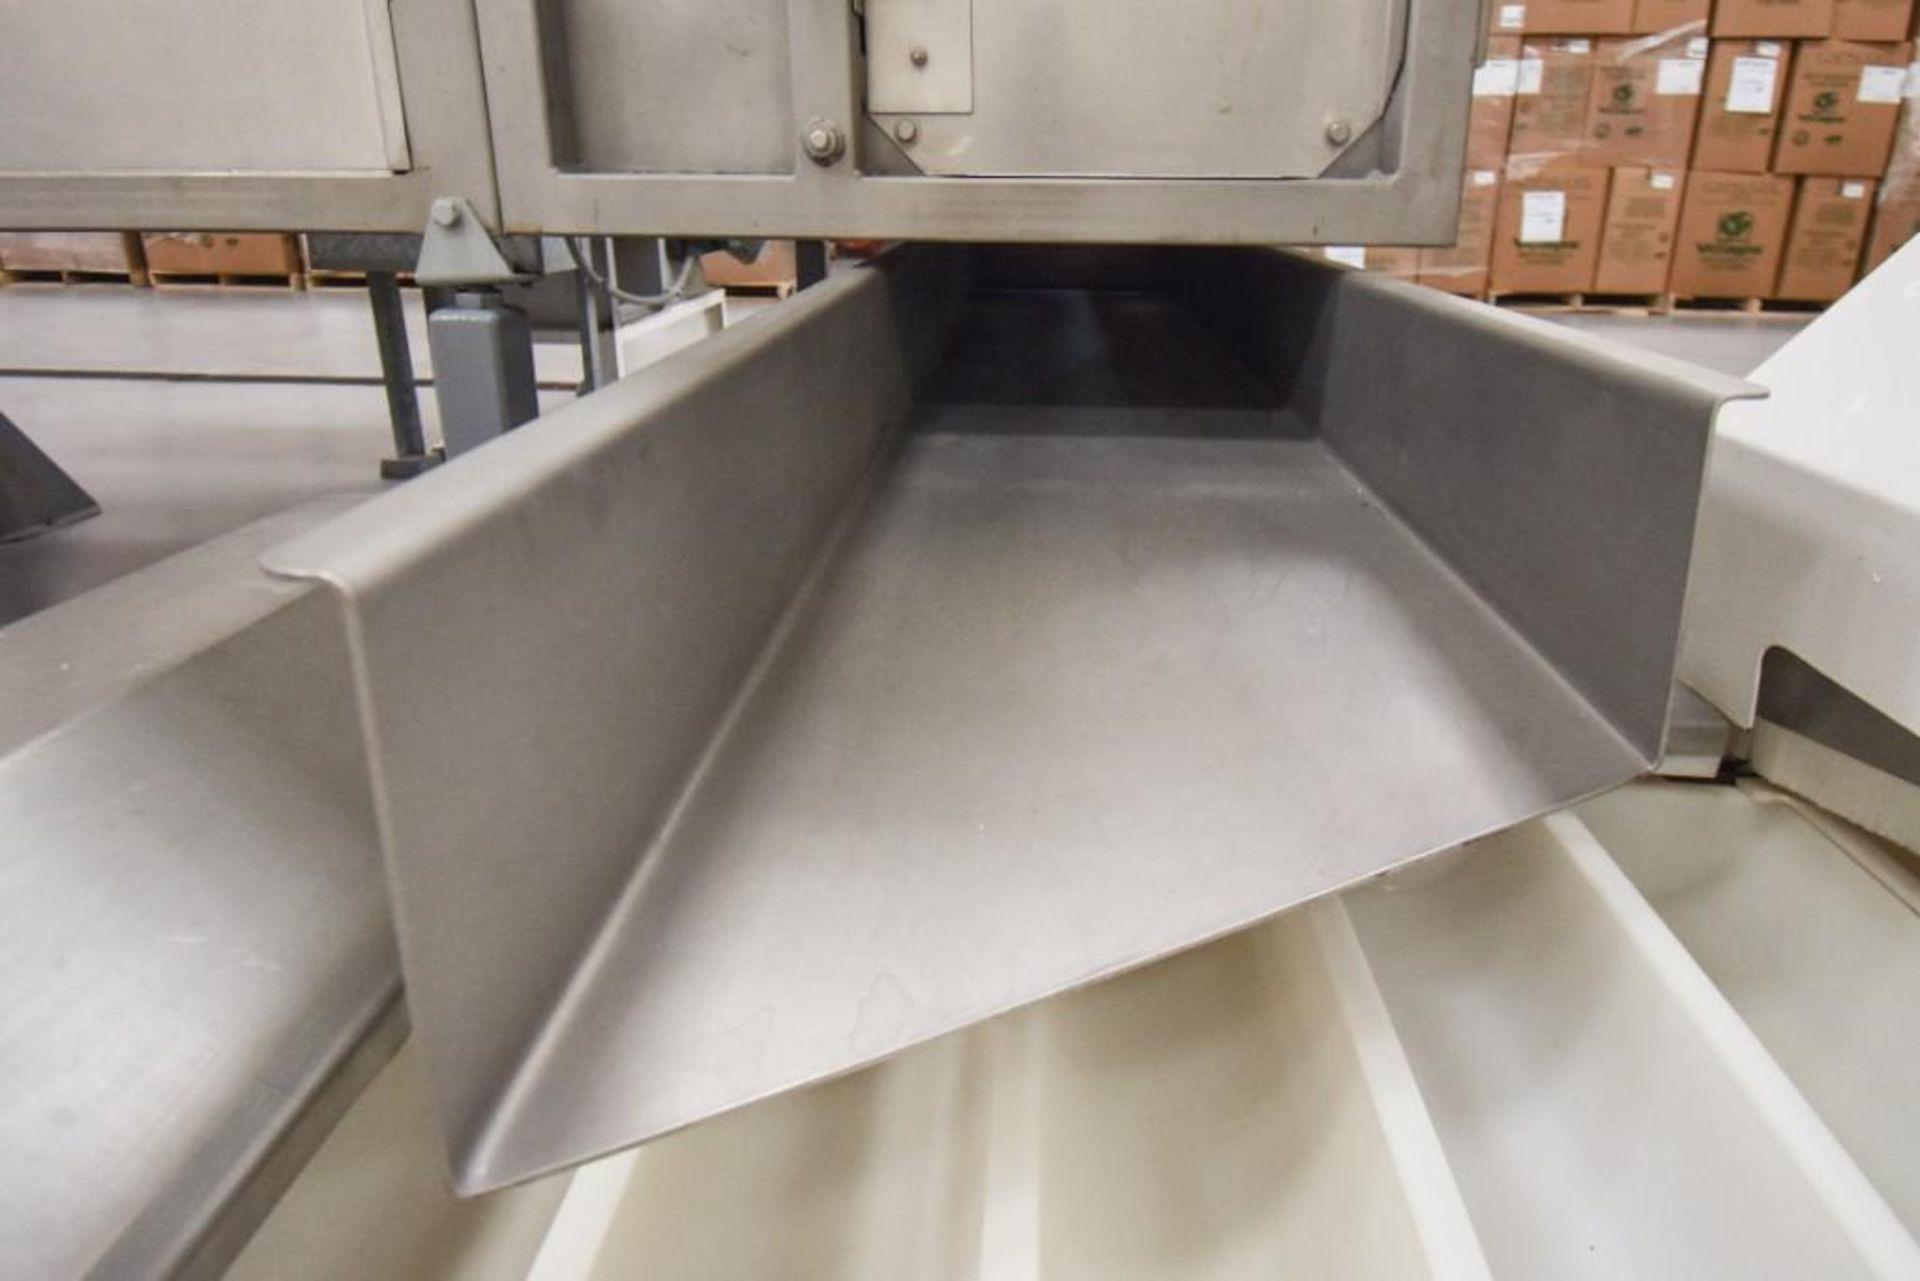 RBM Vibratory Deck VCNF-15X6X7 - Image 4 of 6